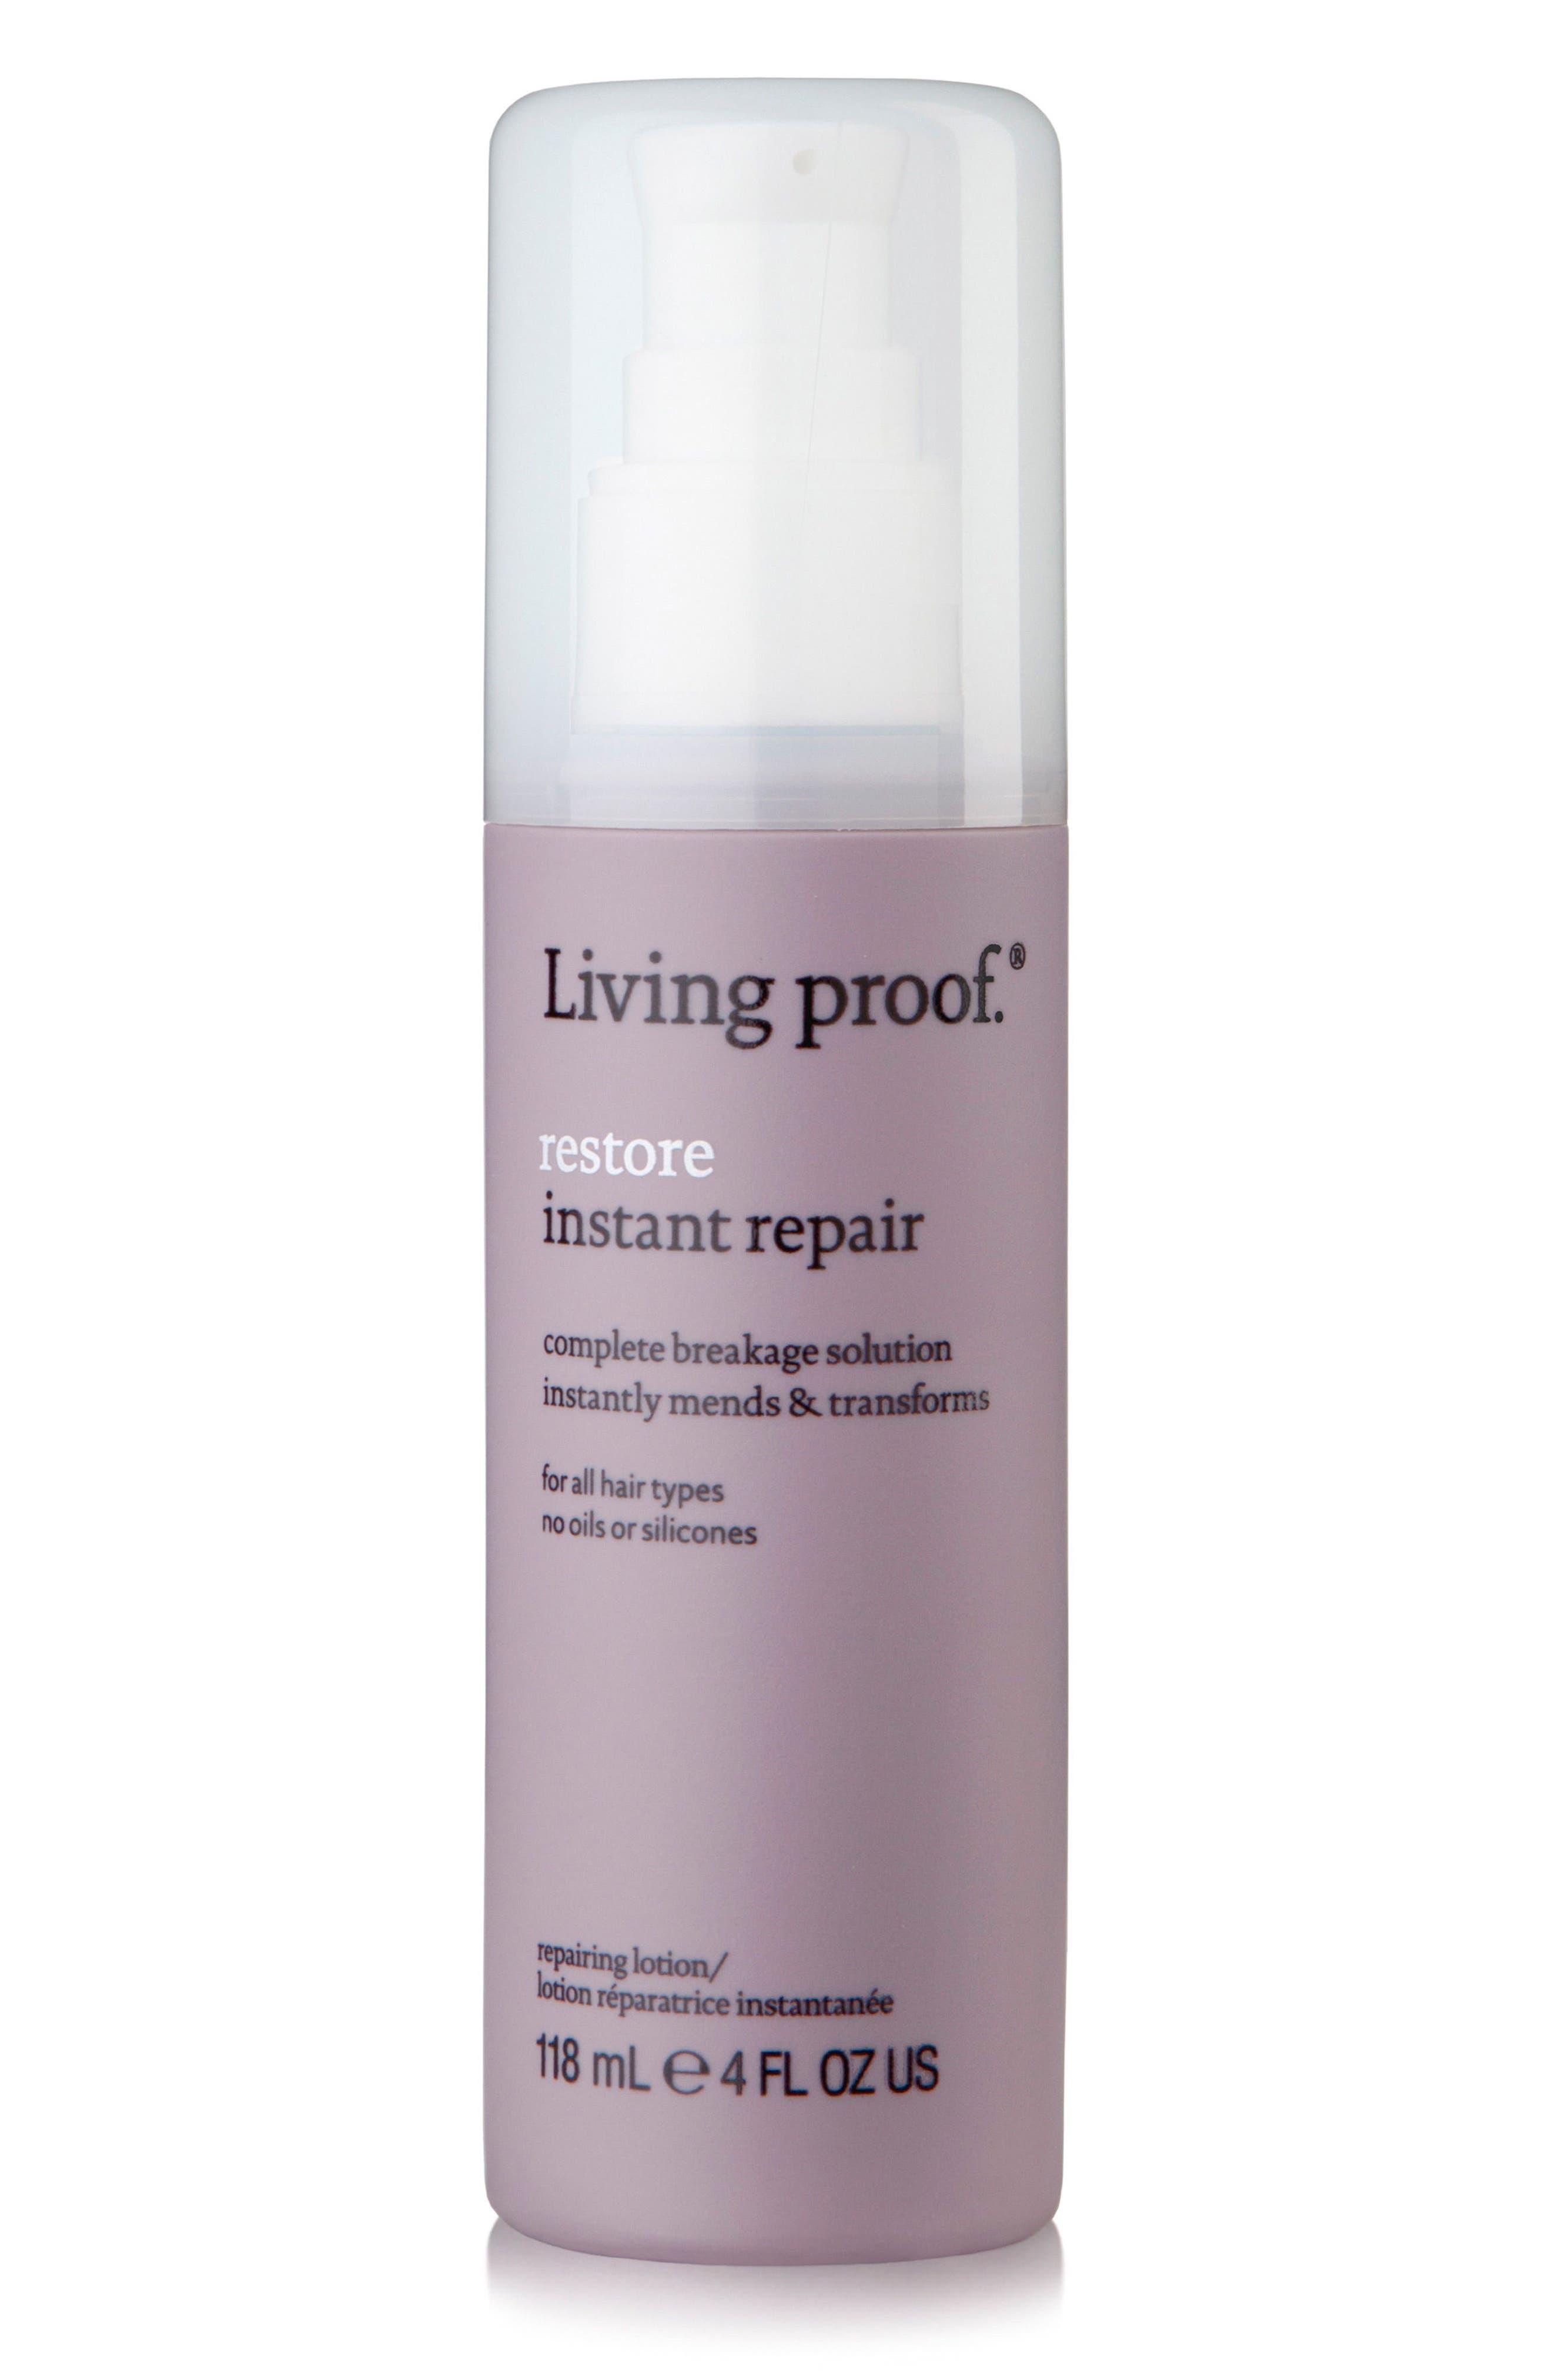 Alternate Image 1 Selected - Living proof® Restore Instant Repair